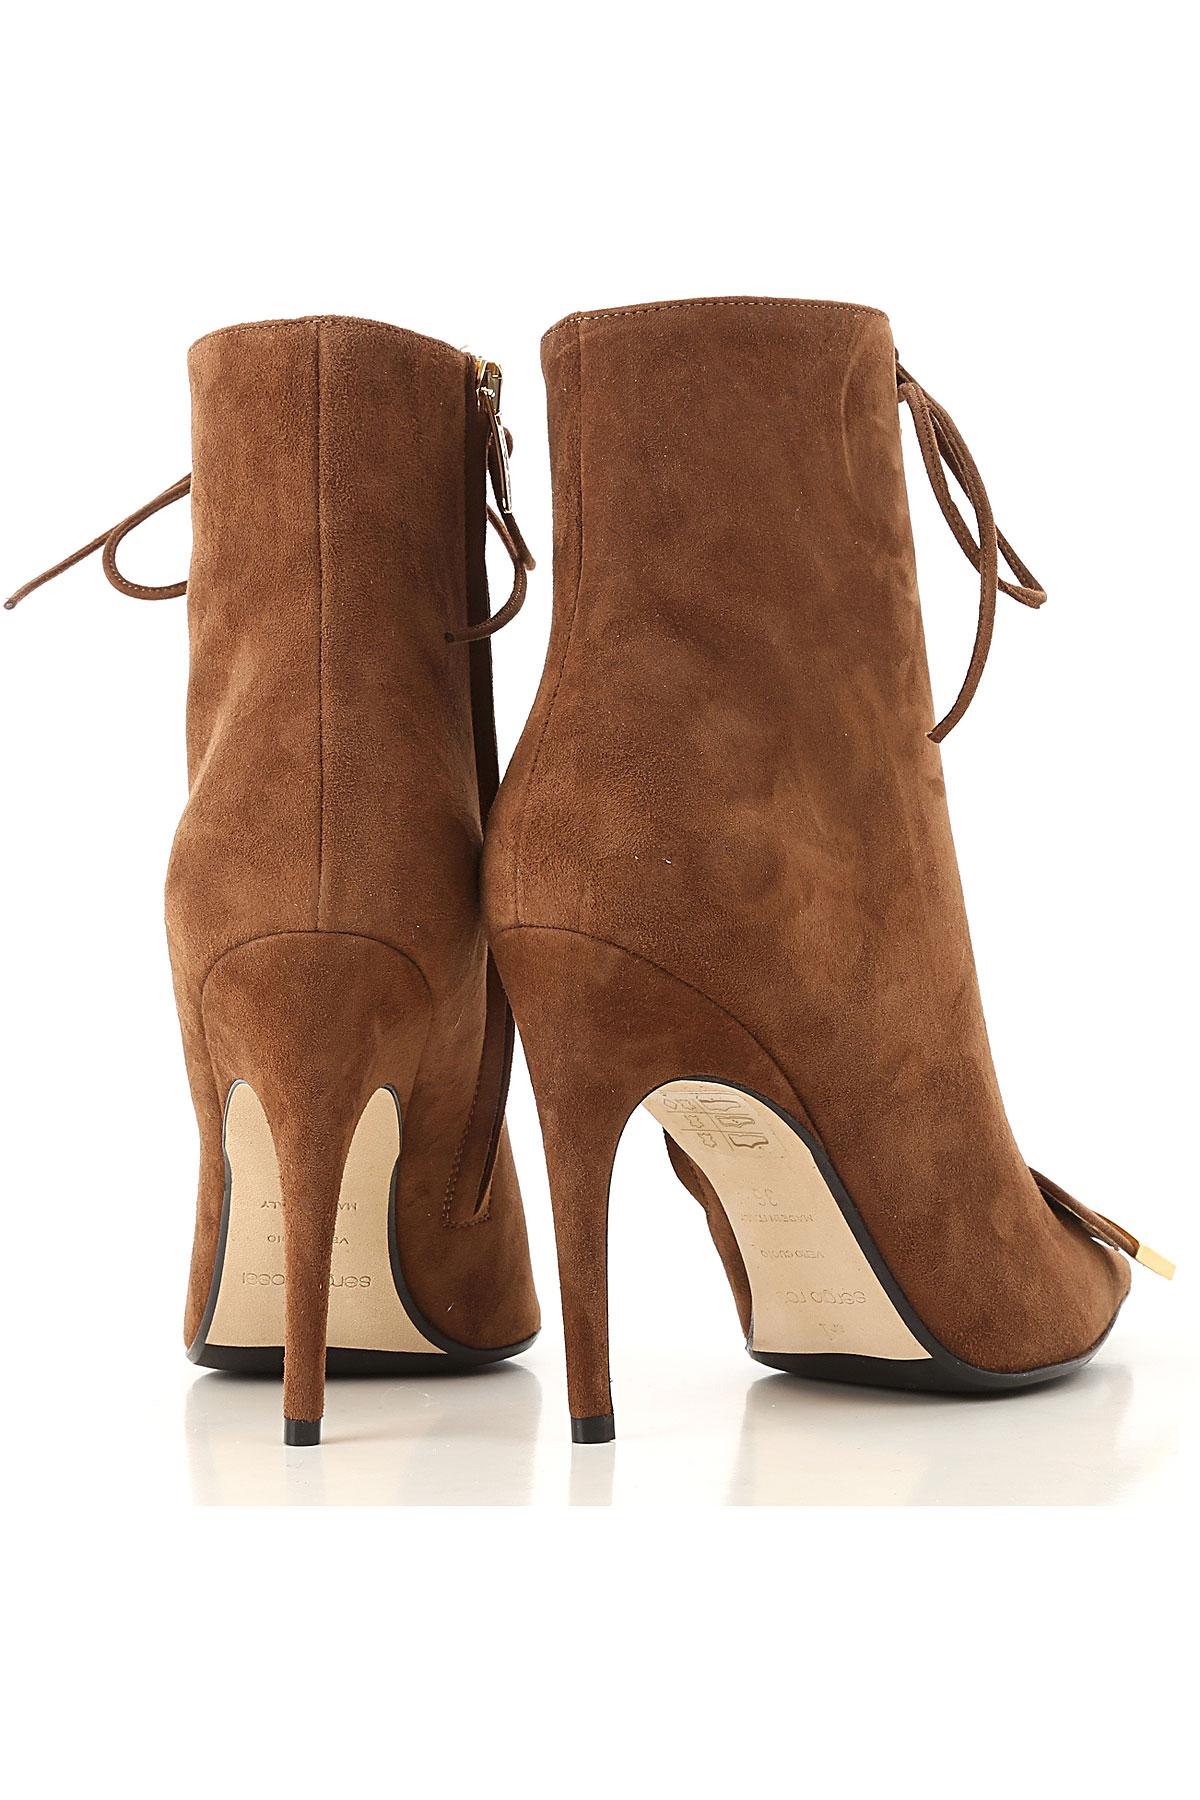 verano nbsp; Primavera Zapatos Para Sergio Toffee Real Rossi 2019 Mujer U67gXn